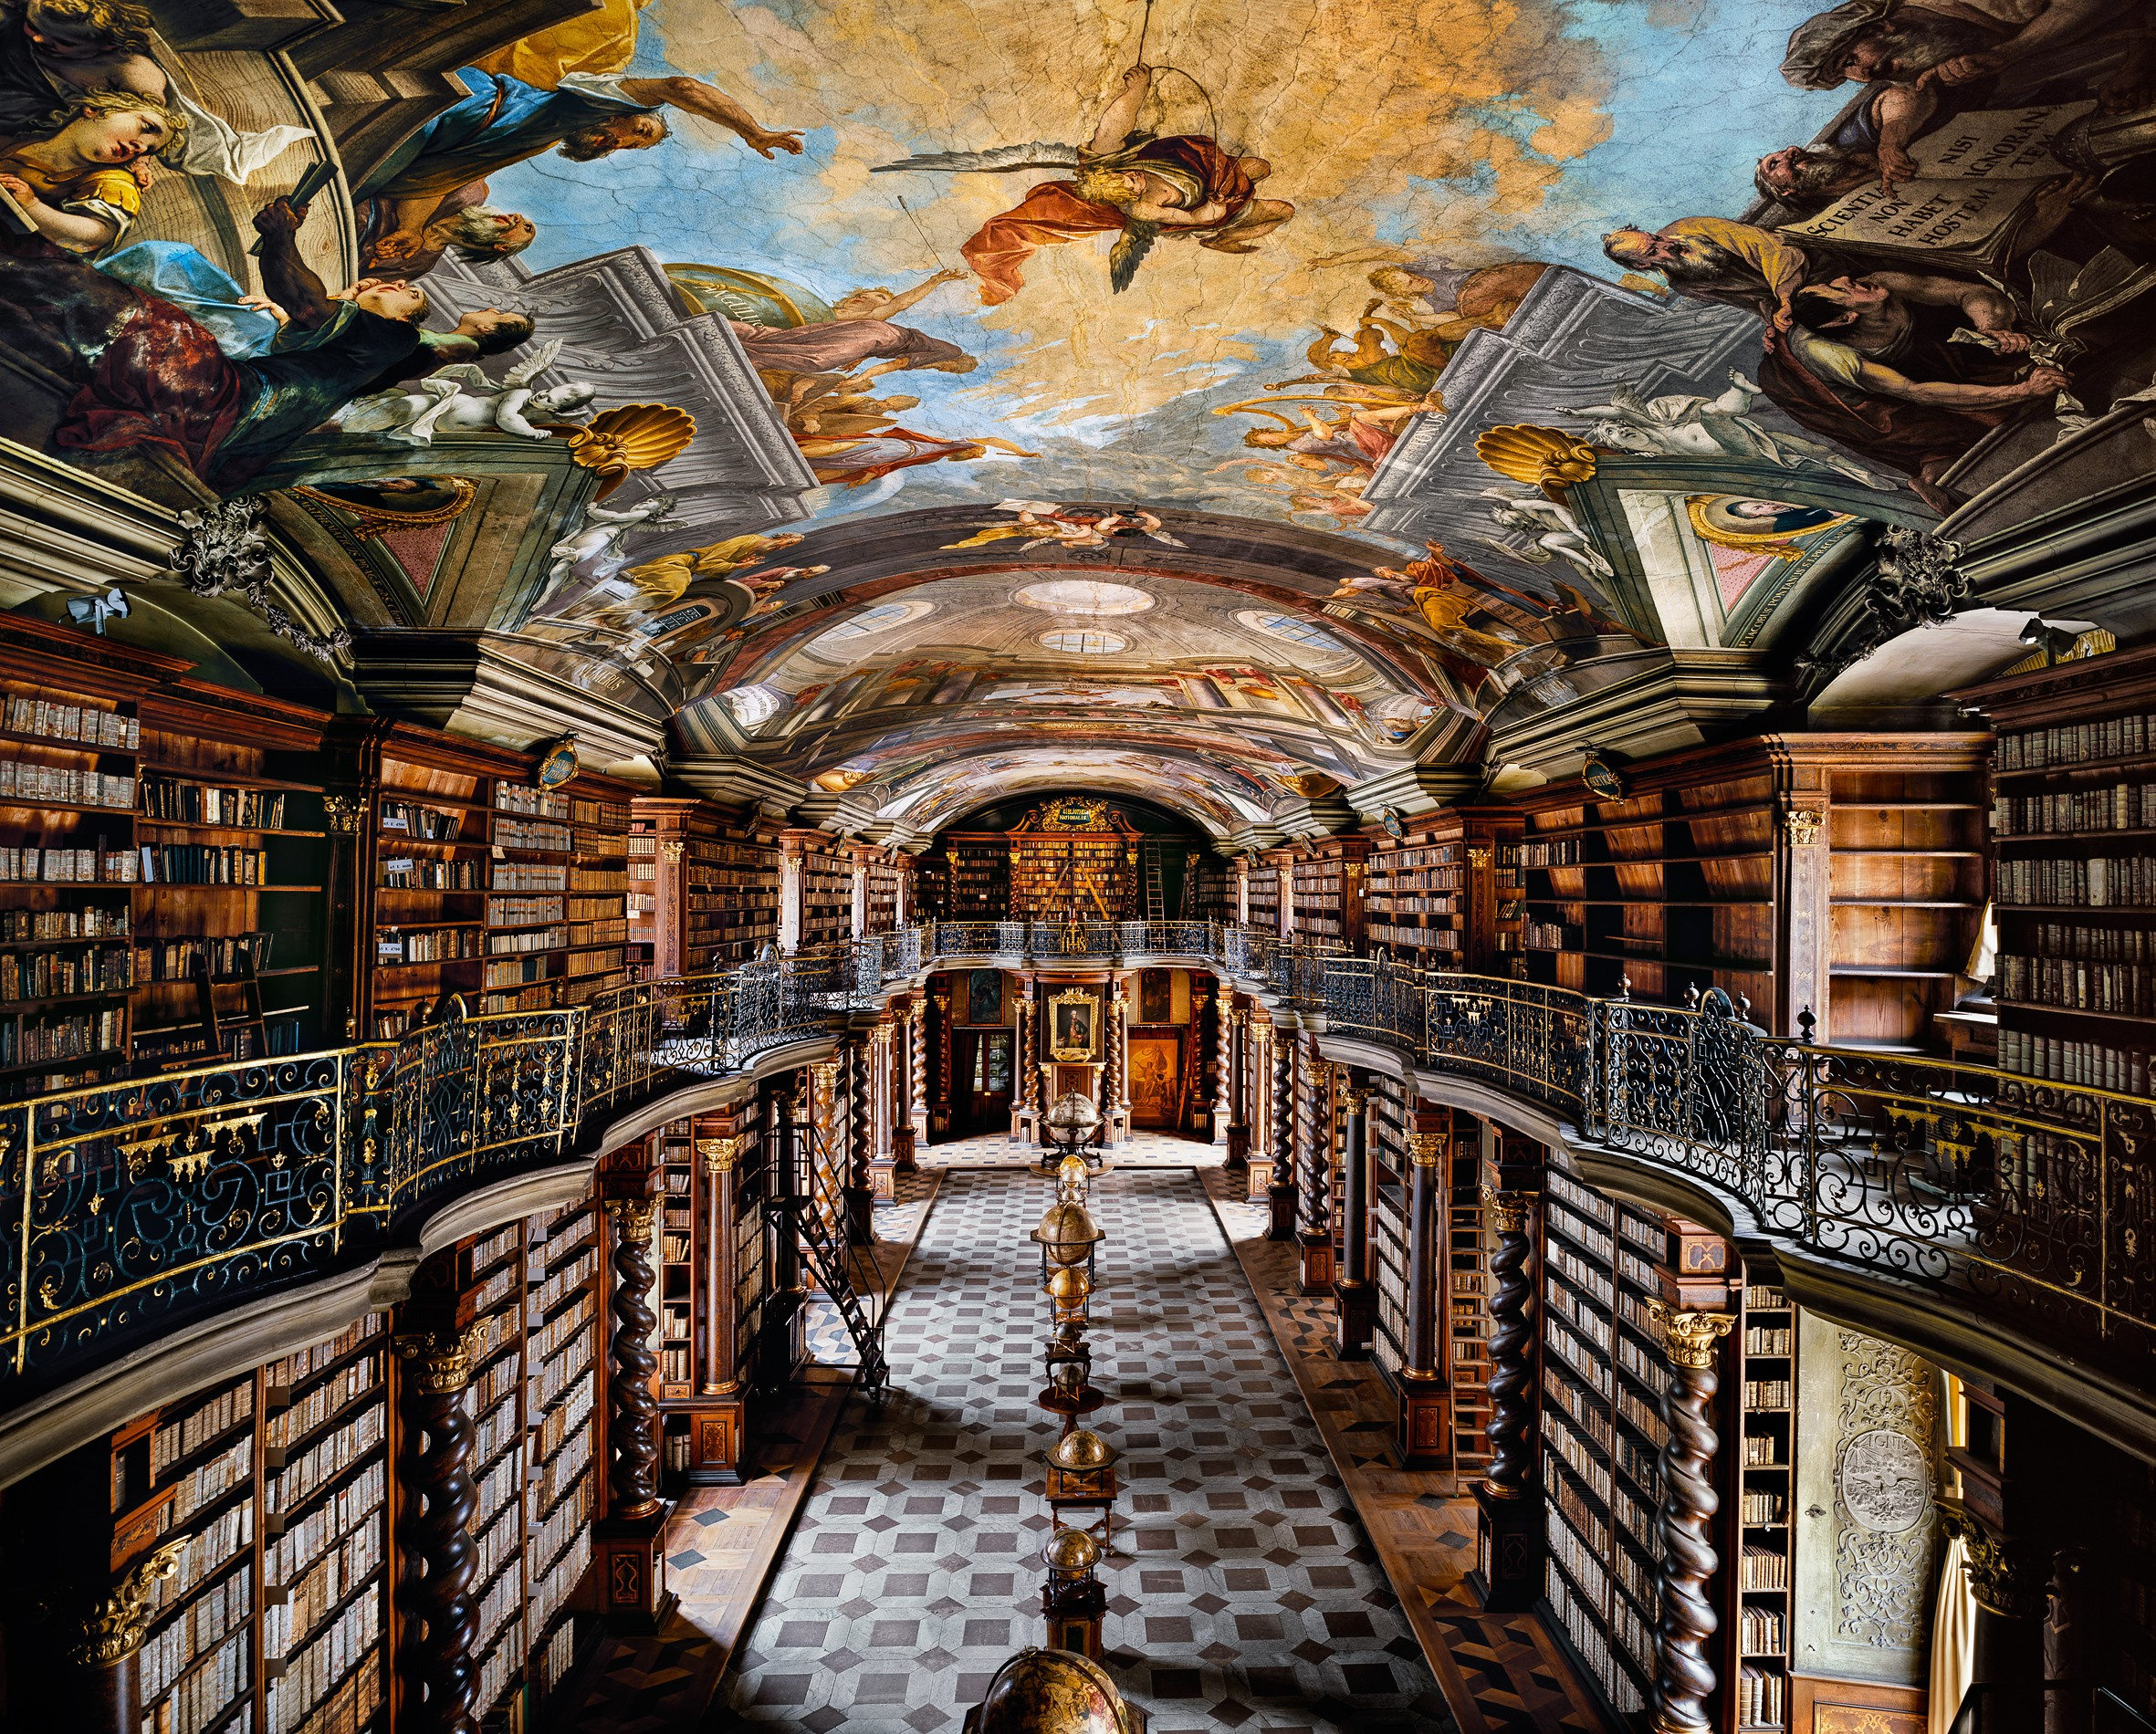 ahmet ertug the national library clementinum prague 2009 diasec 180x224 cm courtesy of elipsis gallery london istanbul